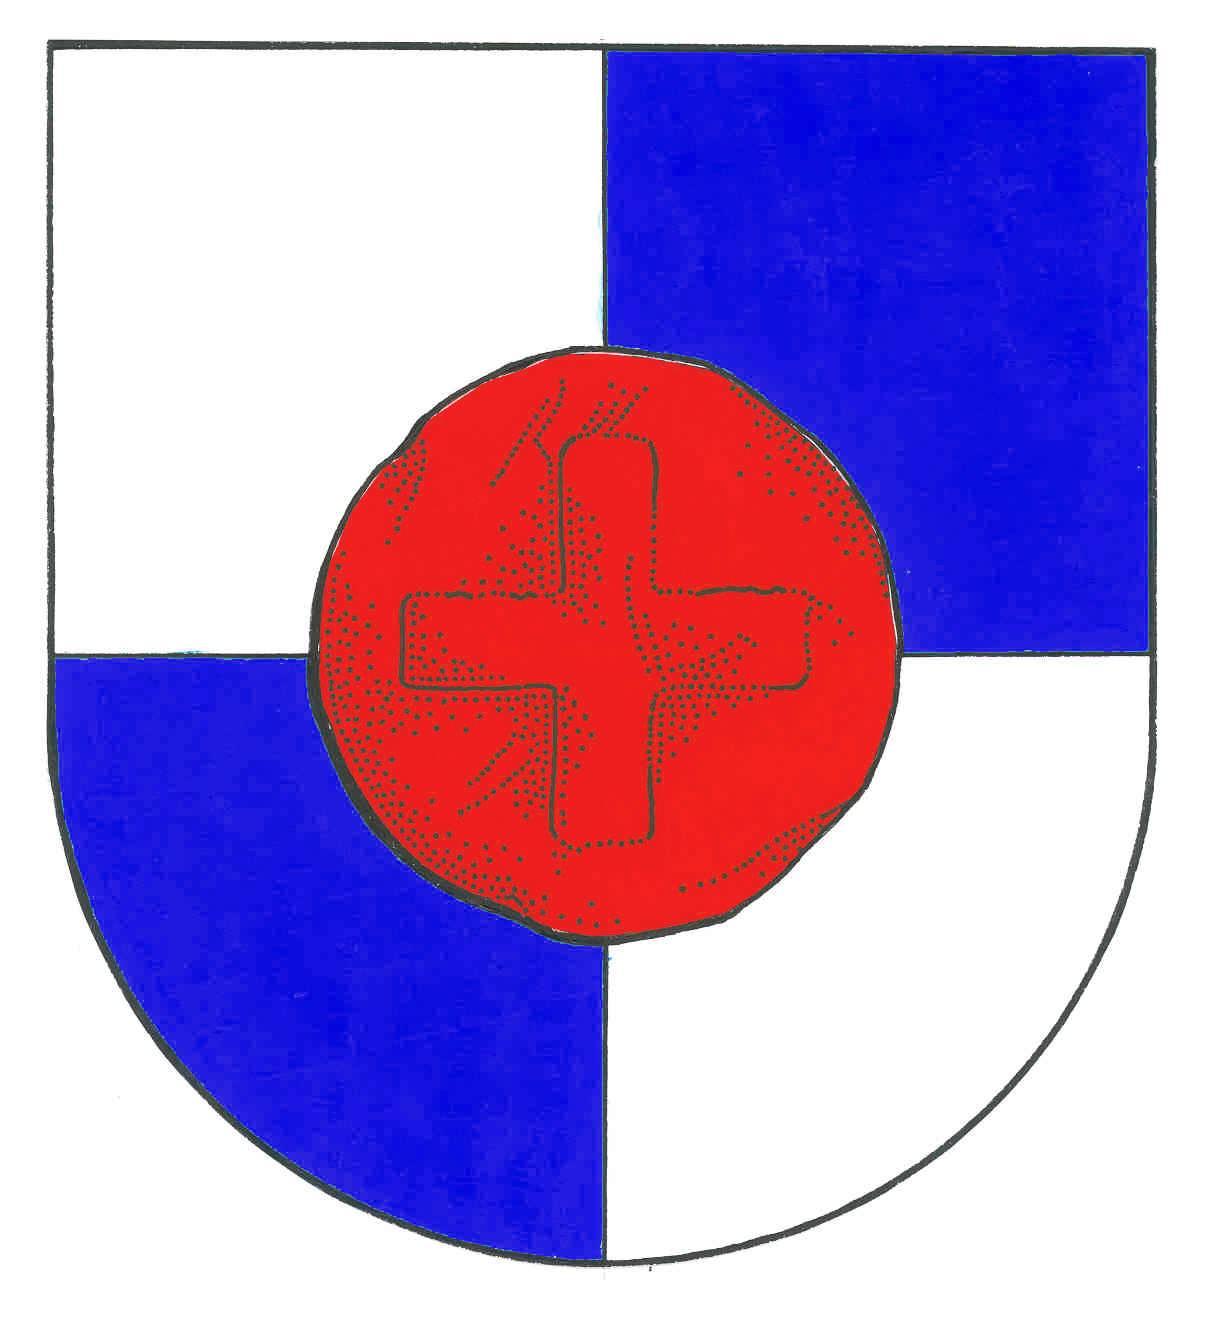 Wappen GemeindeKosel, Kreis Rendsburg-Eckernförde